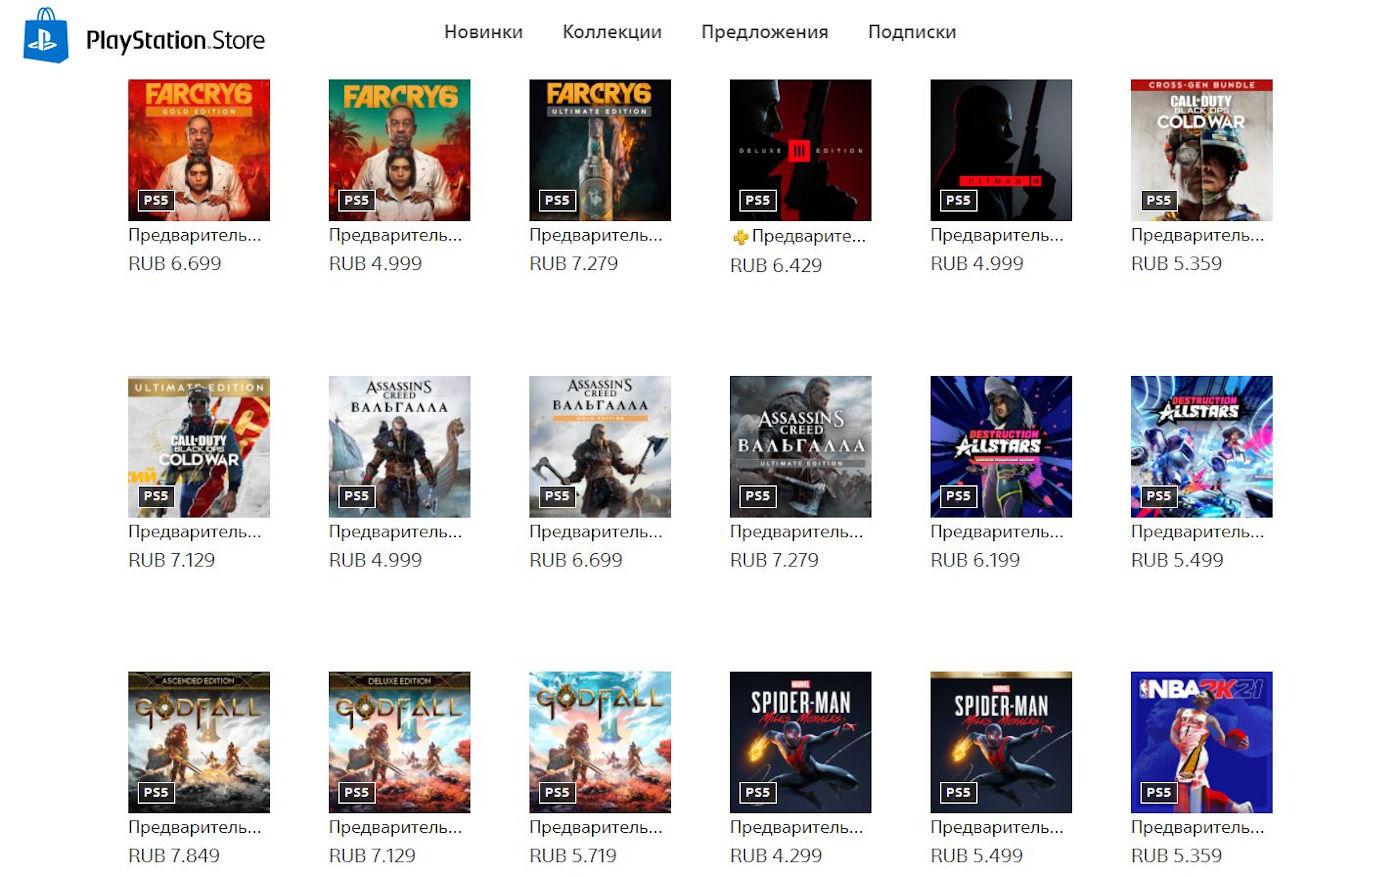 Игры PS5 в PS Store